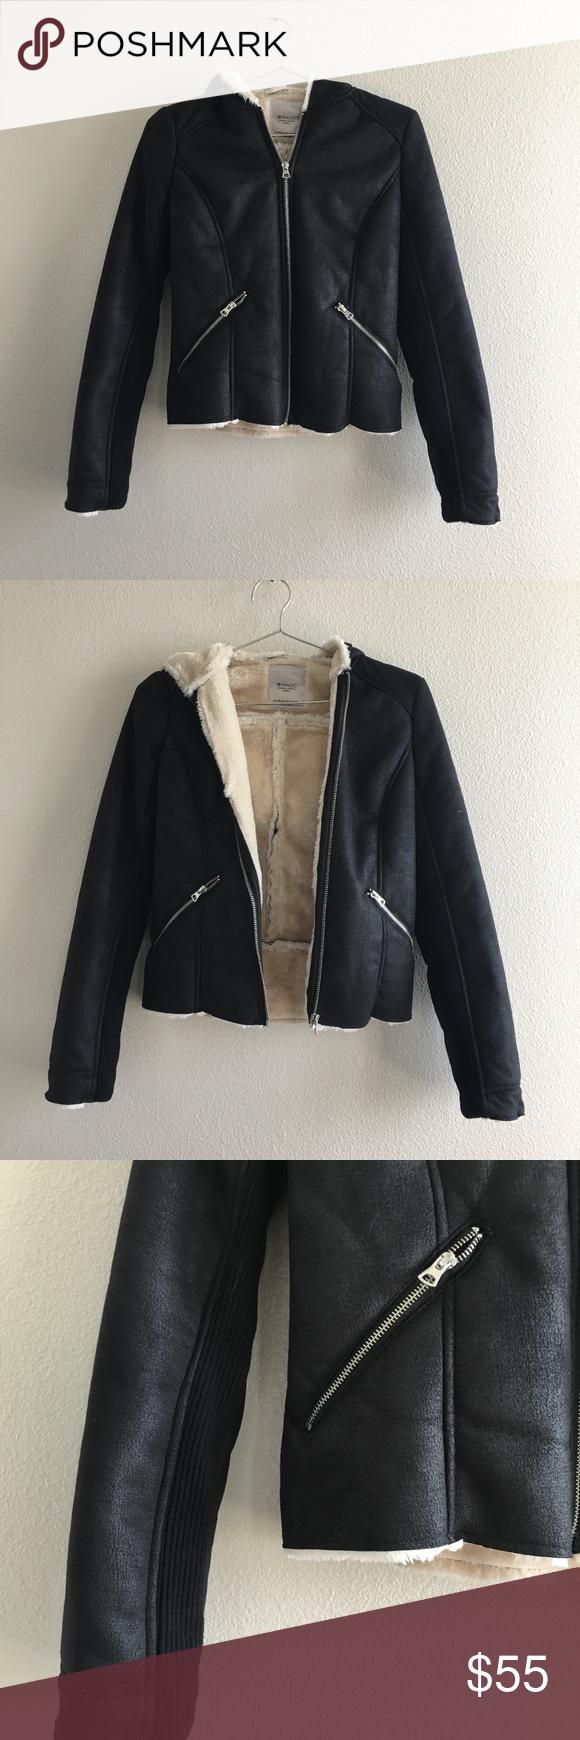 Zara Trafaluc Suede Fur Hoodie Jacket Fur Hoodie Jacket Jackets Hoodie Jacket [ 1740 x 580 Pixel ]